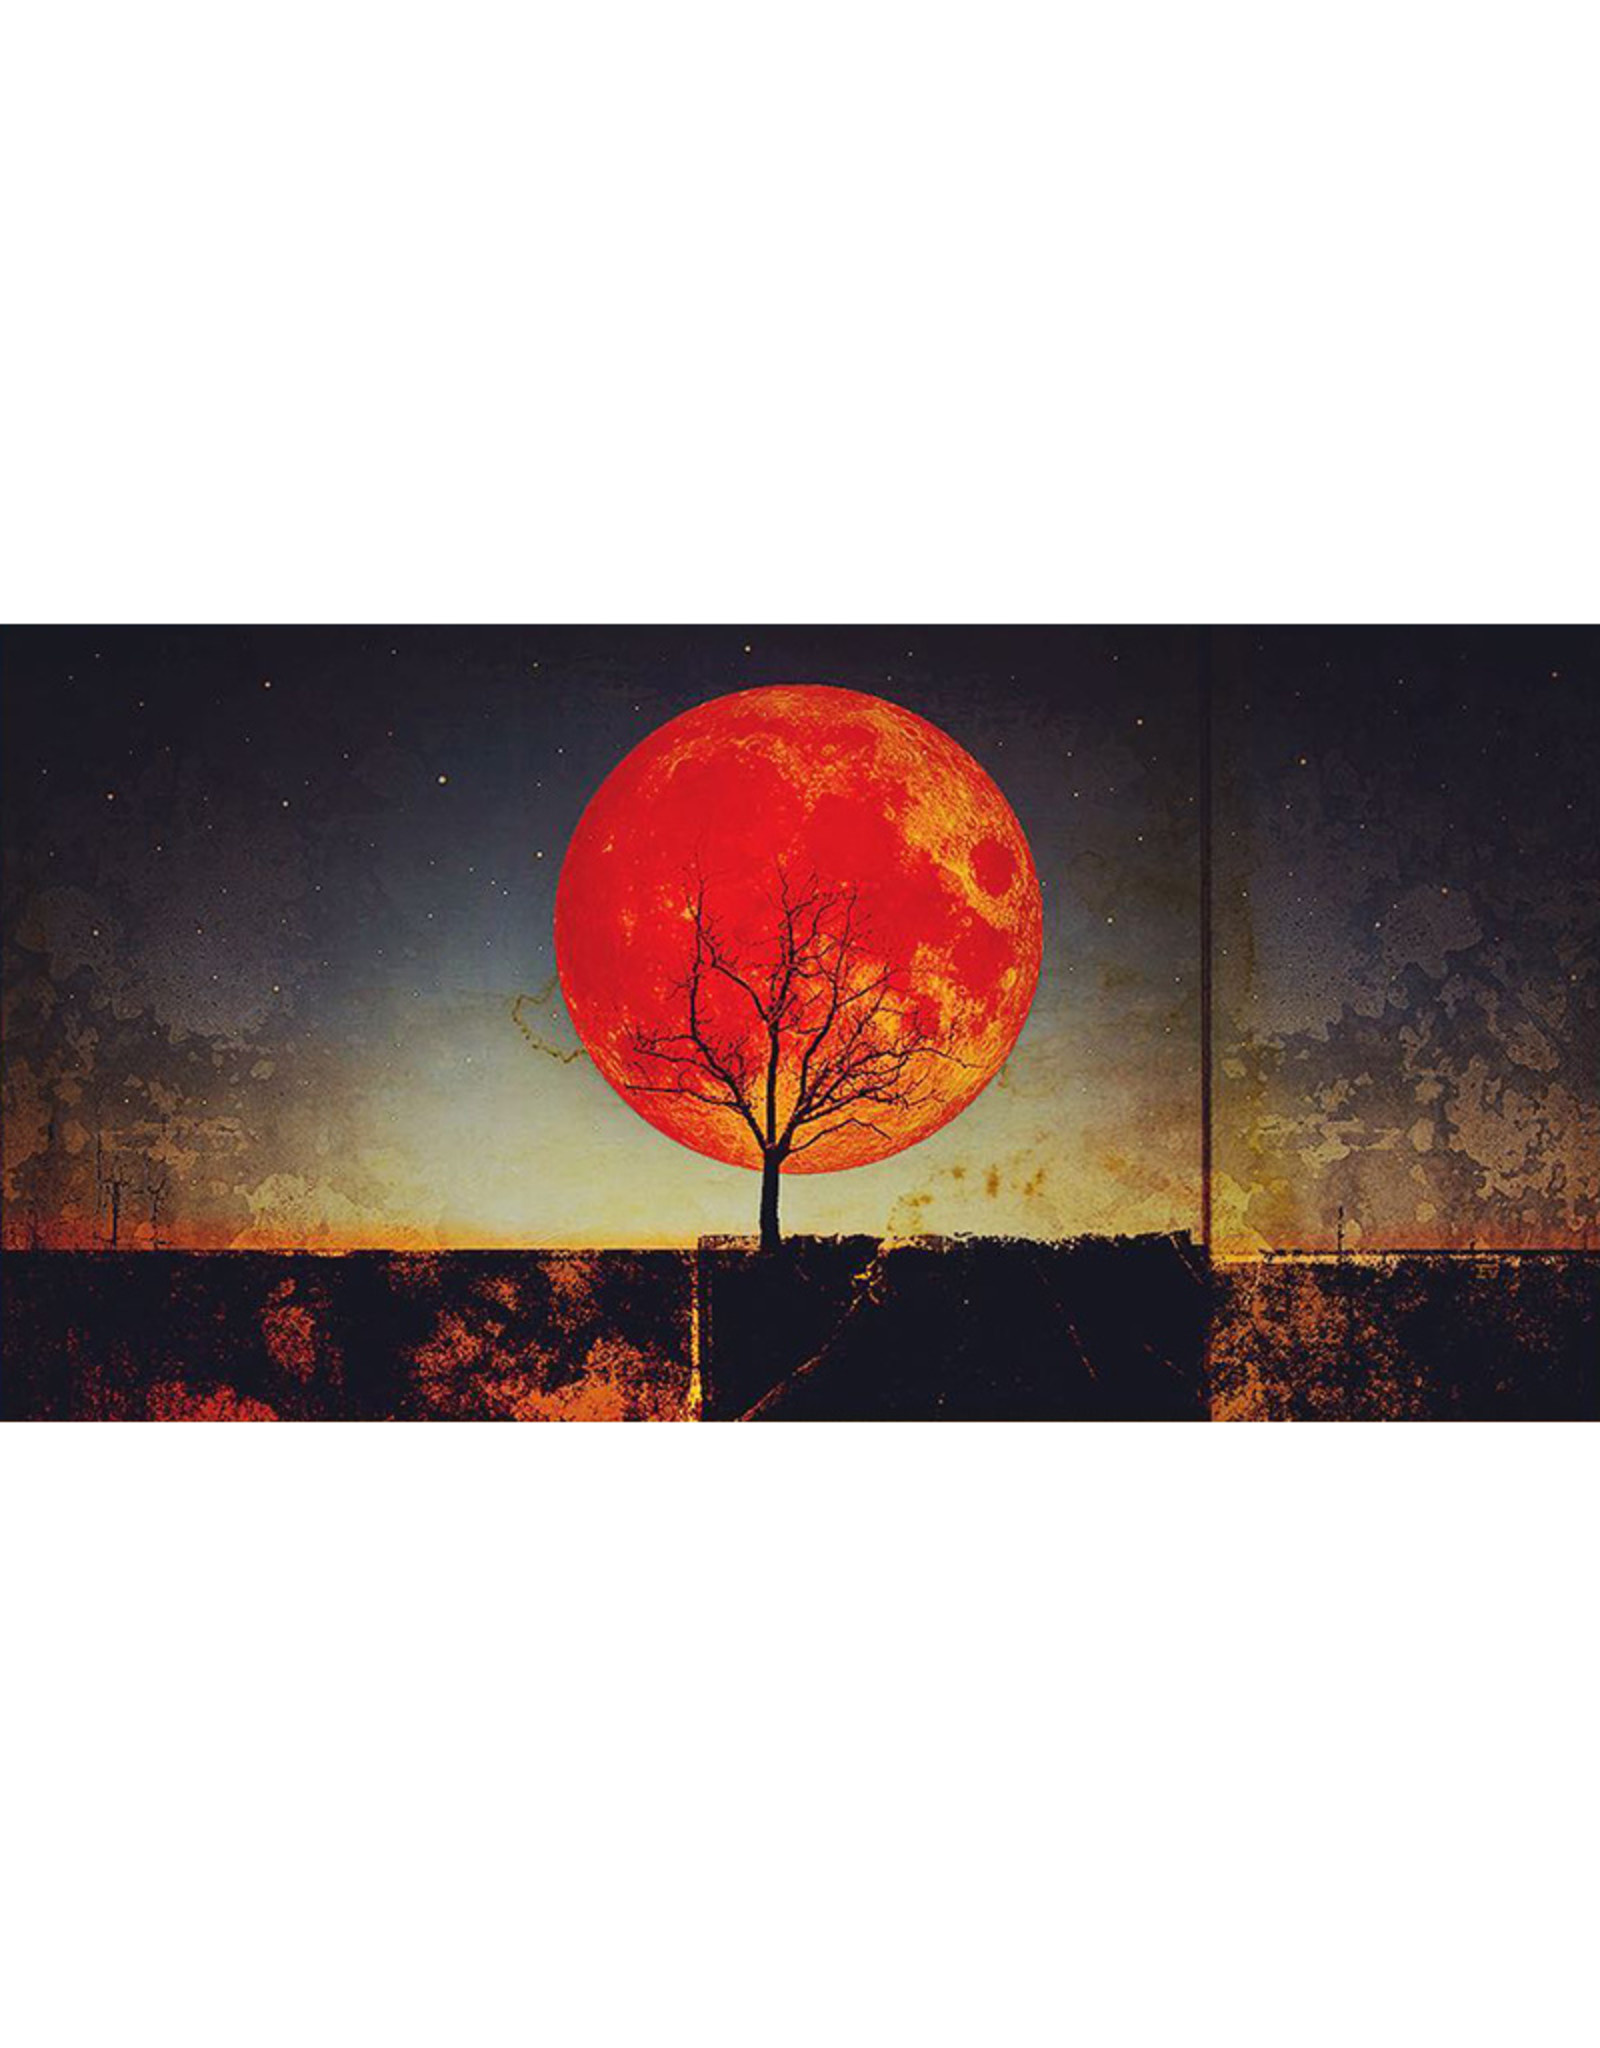 Bryan Fyffe Roots of Earth Series // Bryan Fyffe